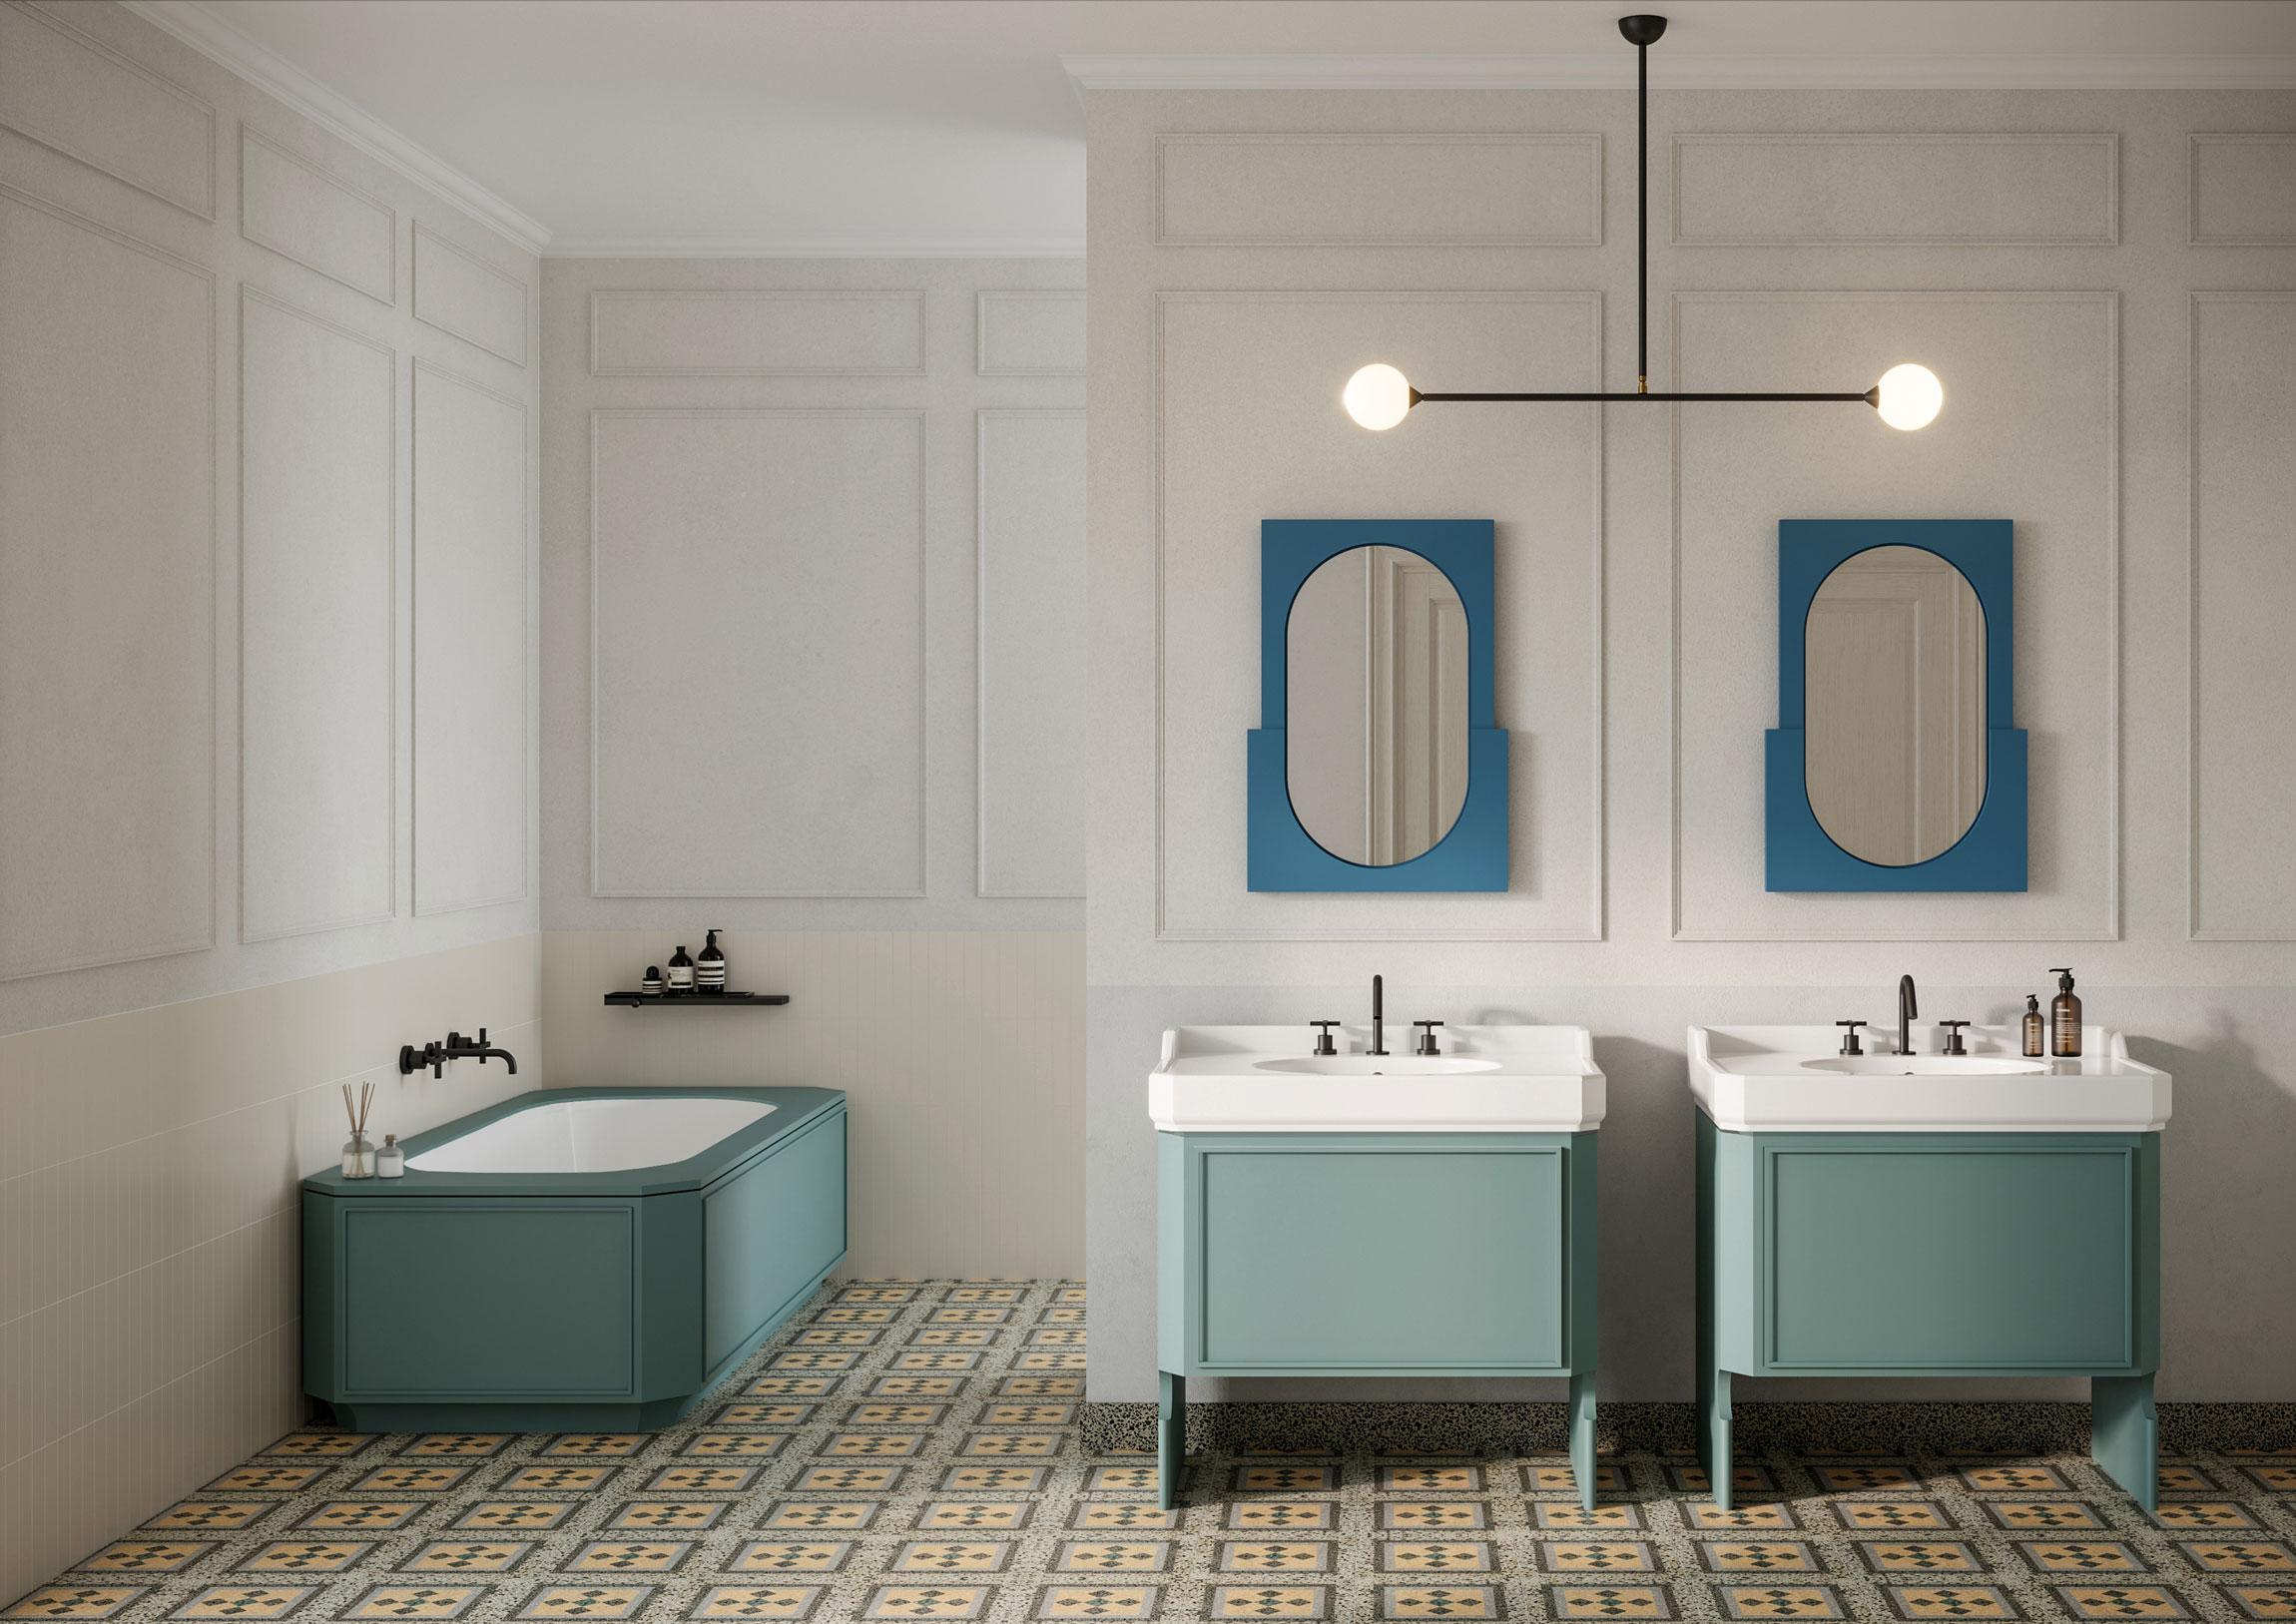 West One Bathrooms ext Nostalgia